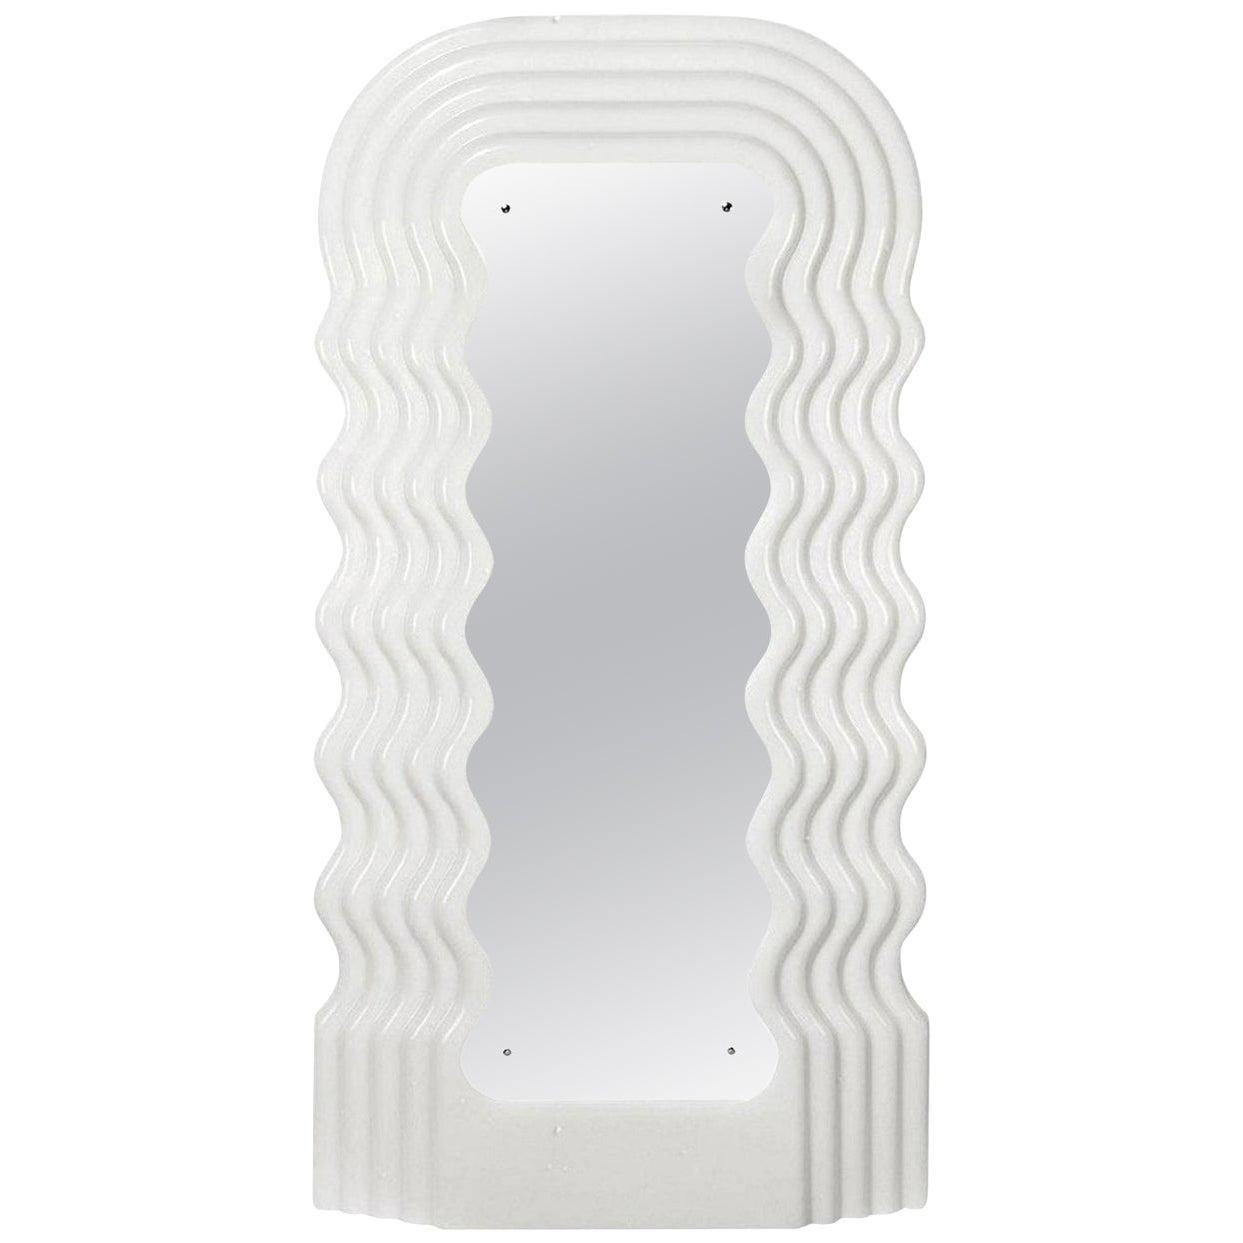 Ultrafragola Mirror/Lamp by Ettore Sottsass for Poltronova, Italy